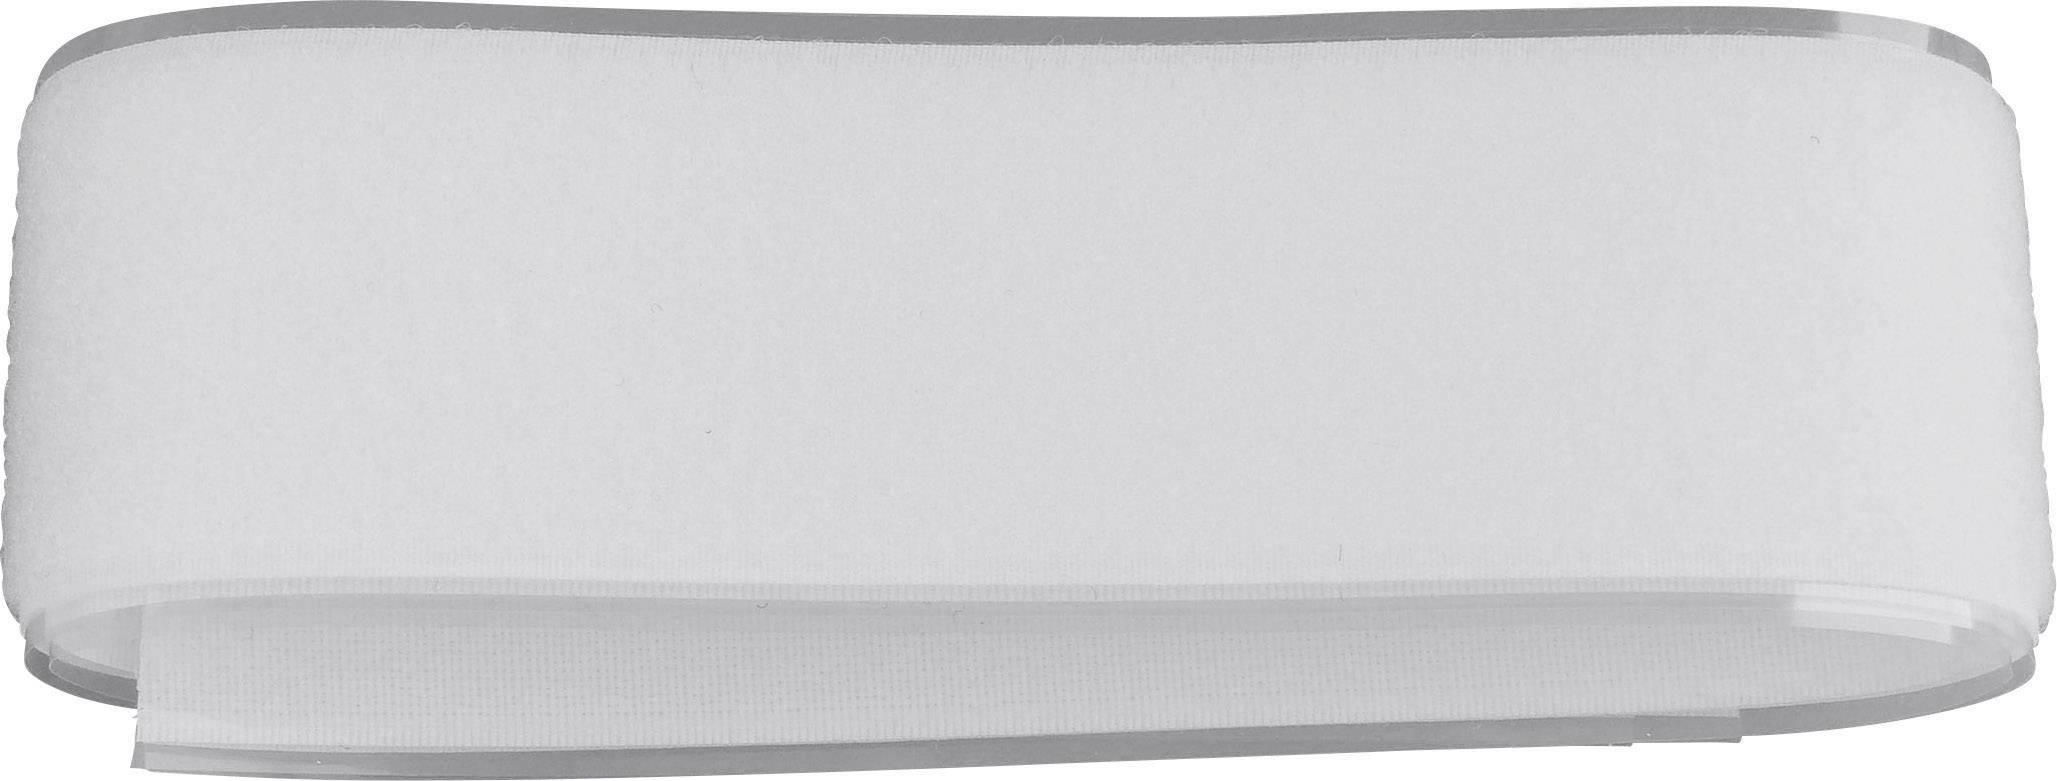 Lepiaci pásik so suchým zipsom TRU COMPONENTS 919-0000-Bag, biela, 1 pár